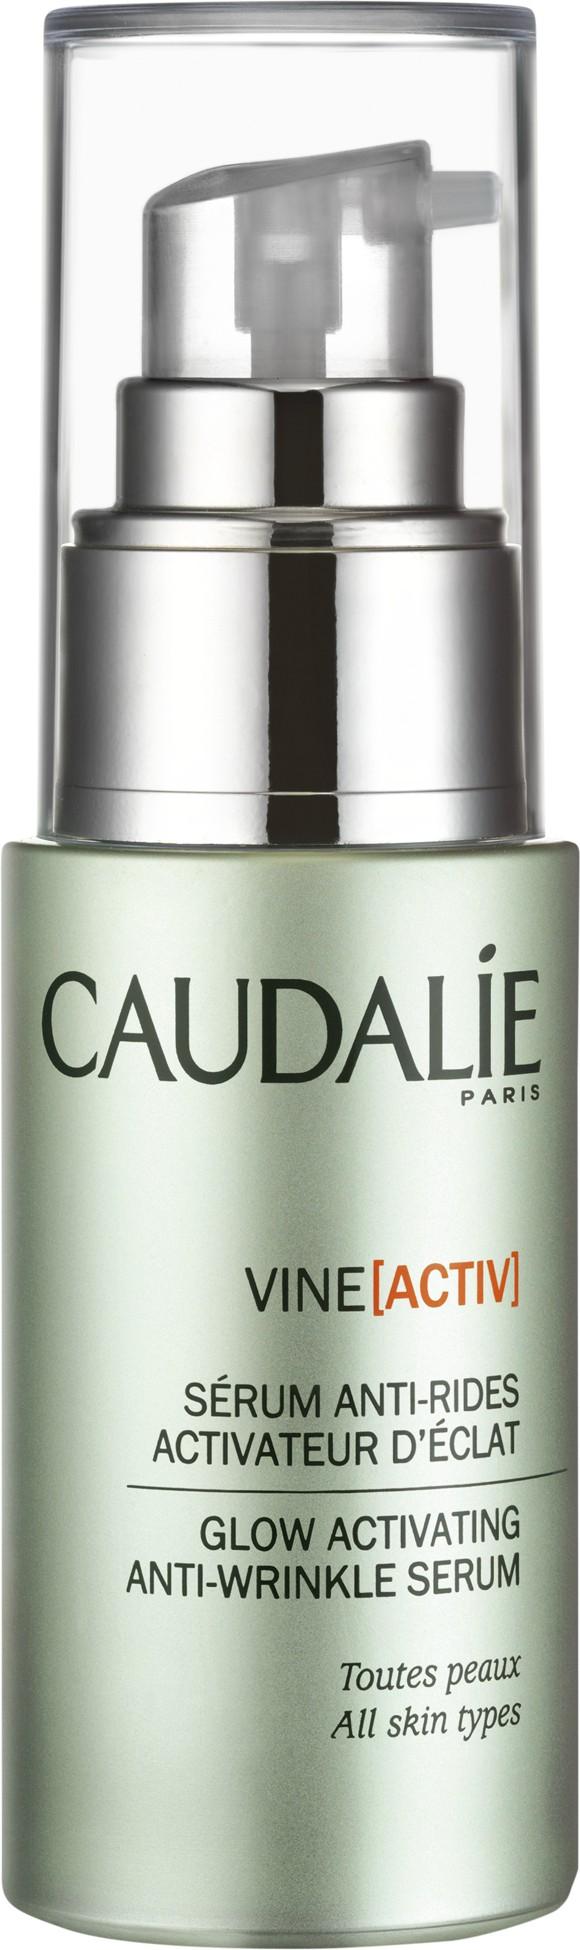 Caudalie - VineActiv Glow Activating Anti-wrinkle Serum 30 ml